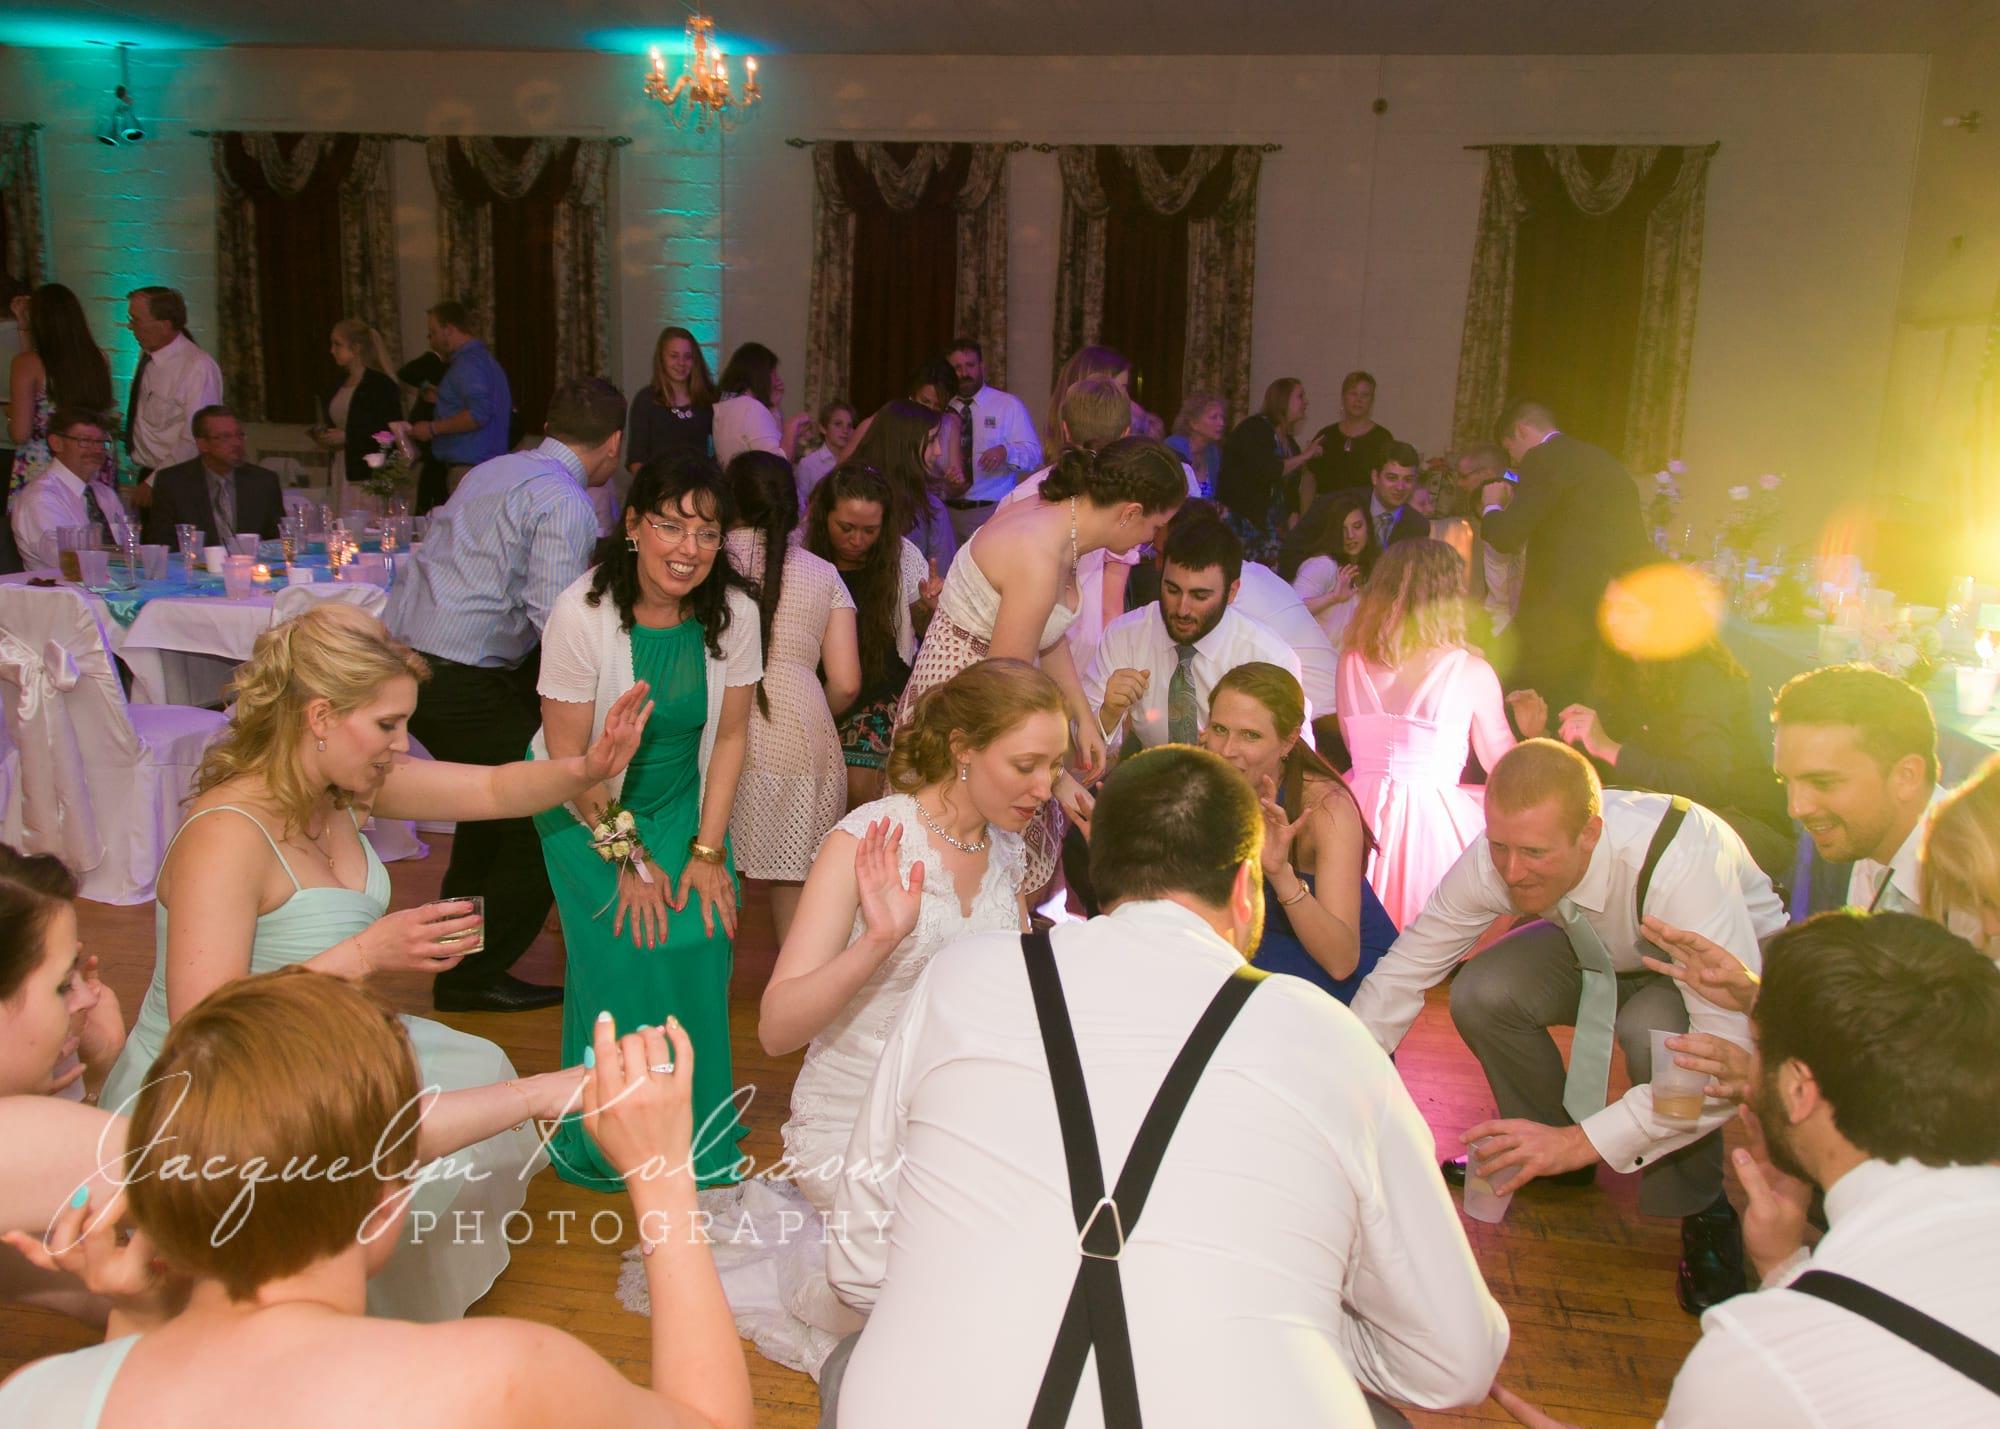 Kutztown PA Wedding DJ Services